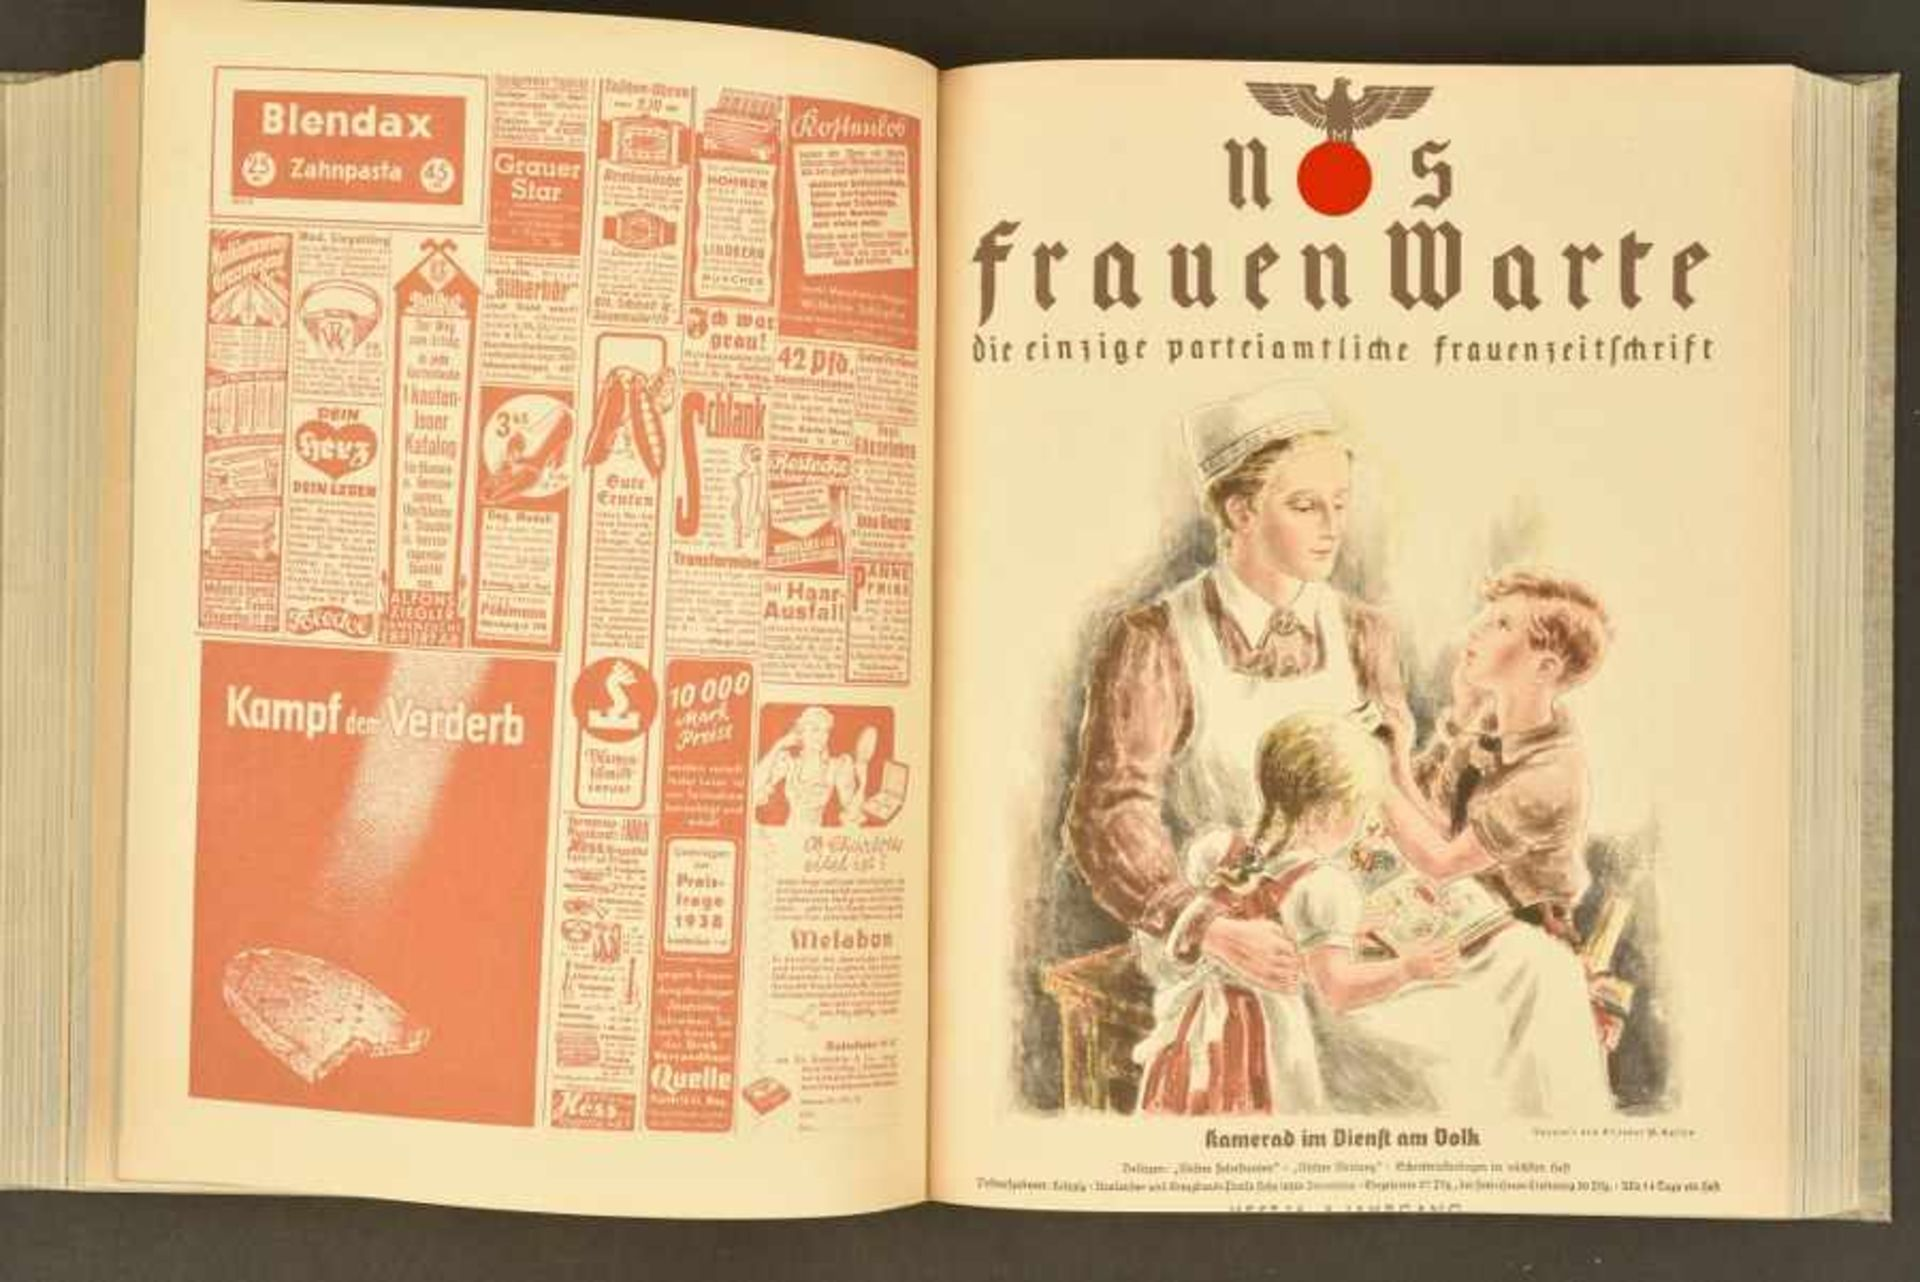 Los 1845 - Ouvrage NS FrauenwarteOuvrage complet. Couverture marquée en lettre d'or NS Frauenwarte, et l'